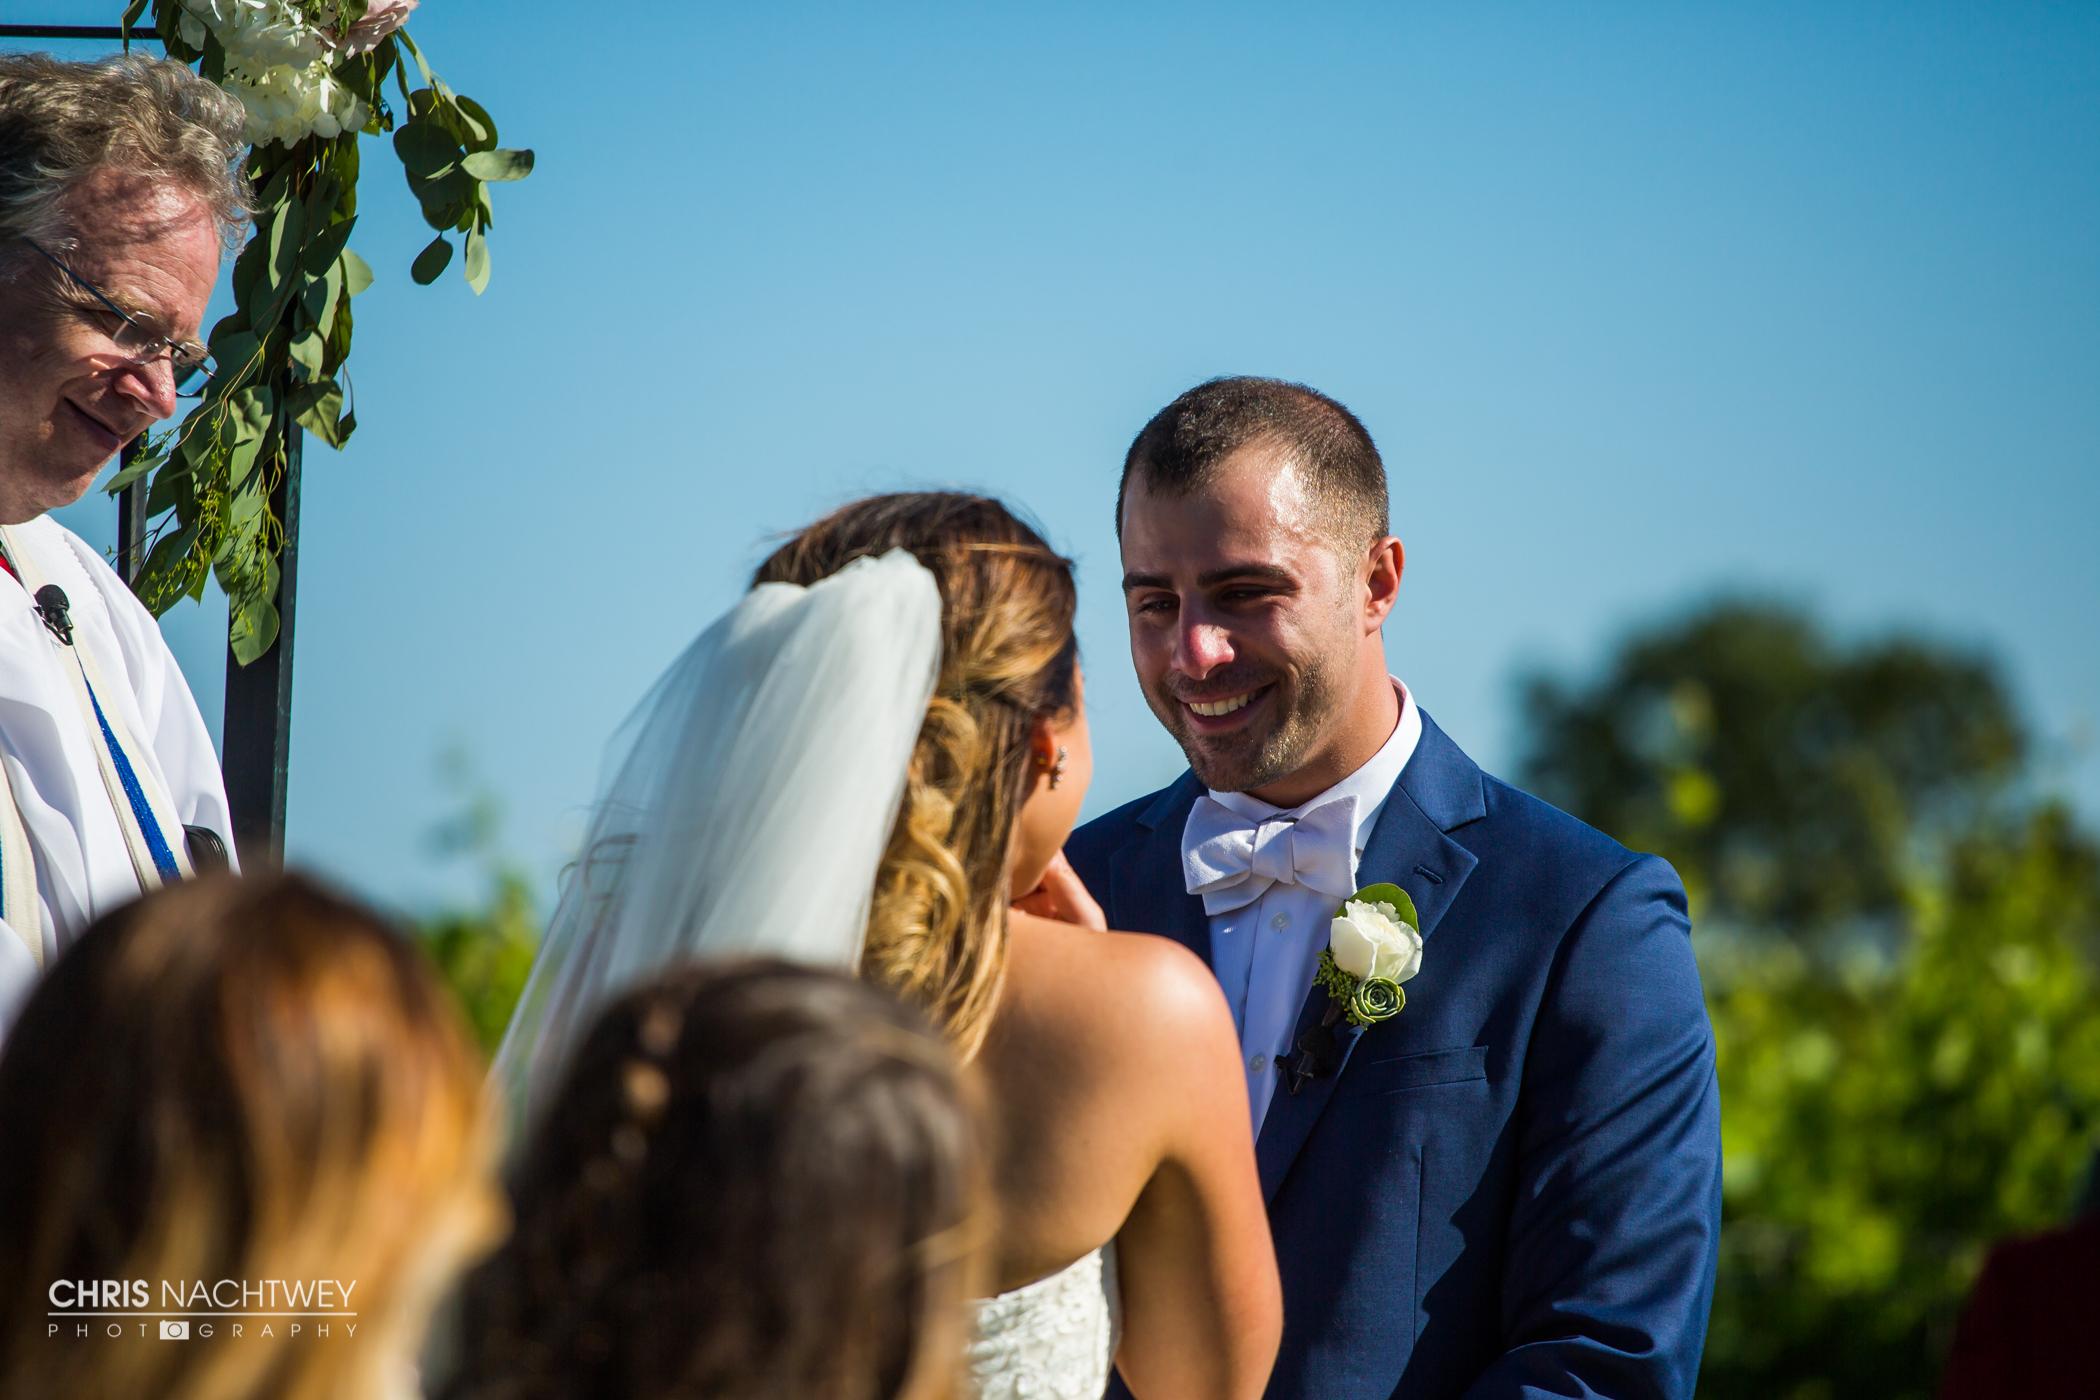 saltwater-farm-vineyard-wedding-photos-lindsay-gabe-chris-nachtwey-photography-2017-35.jpg